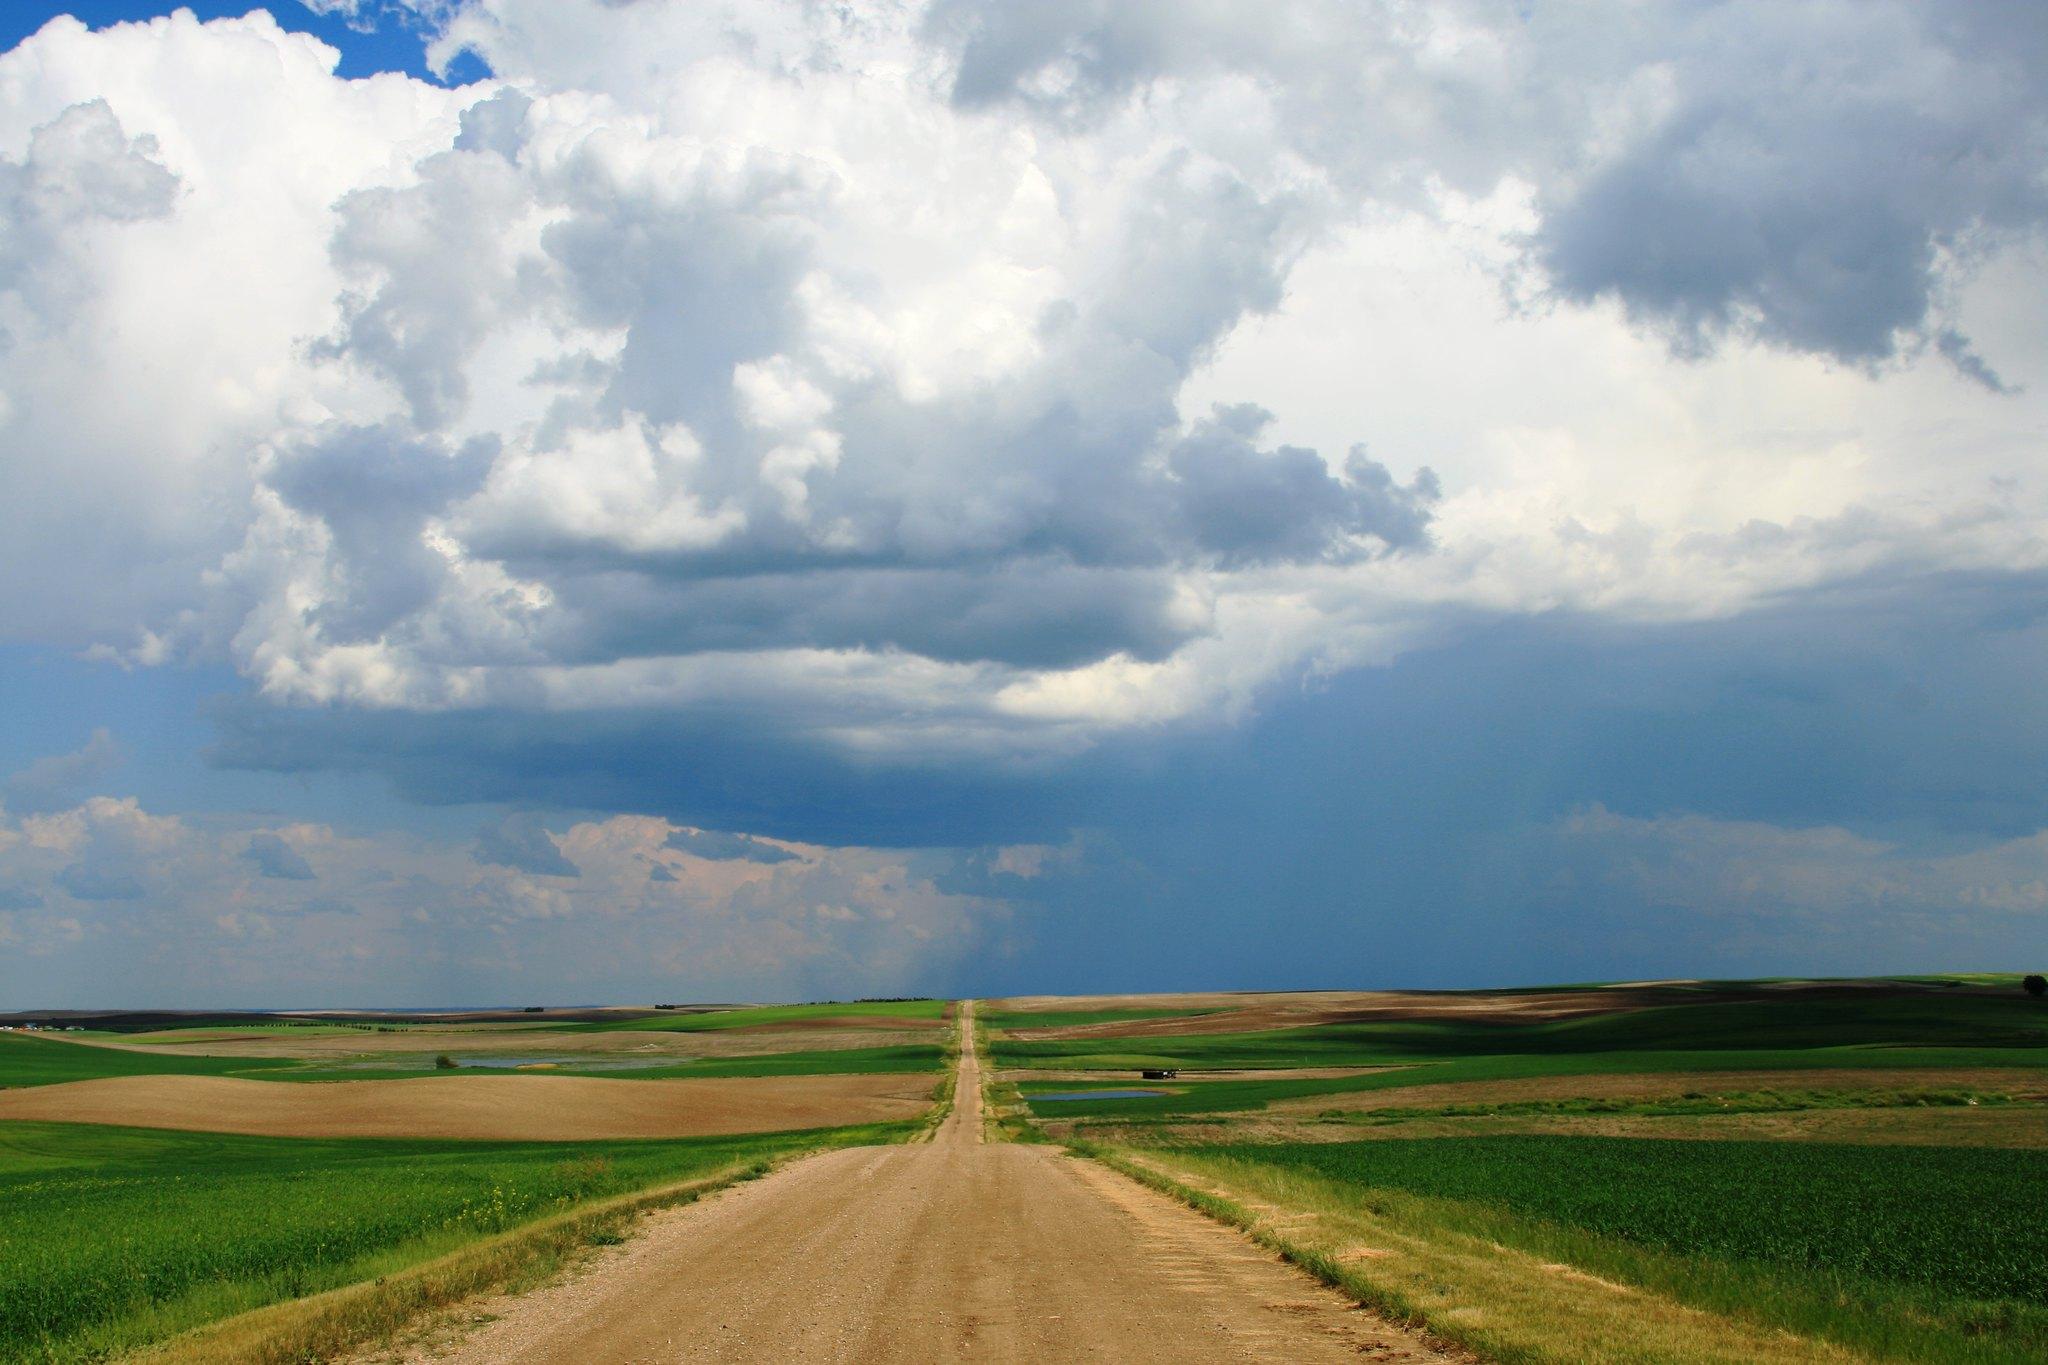 Road through Saskatchewan wheat fields